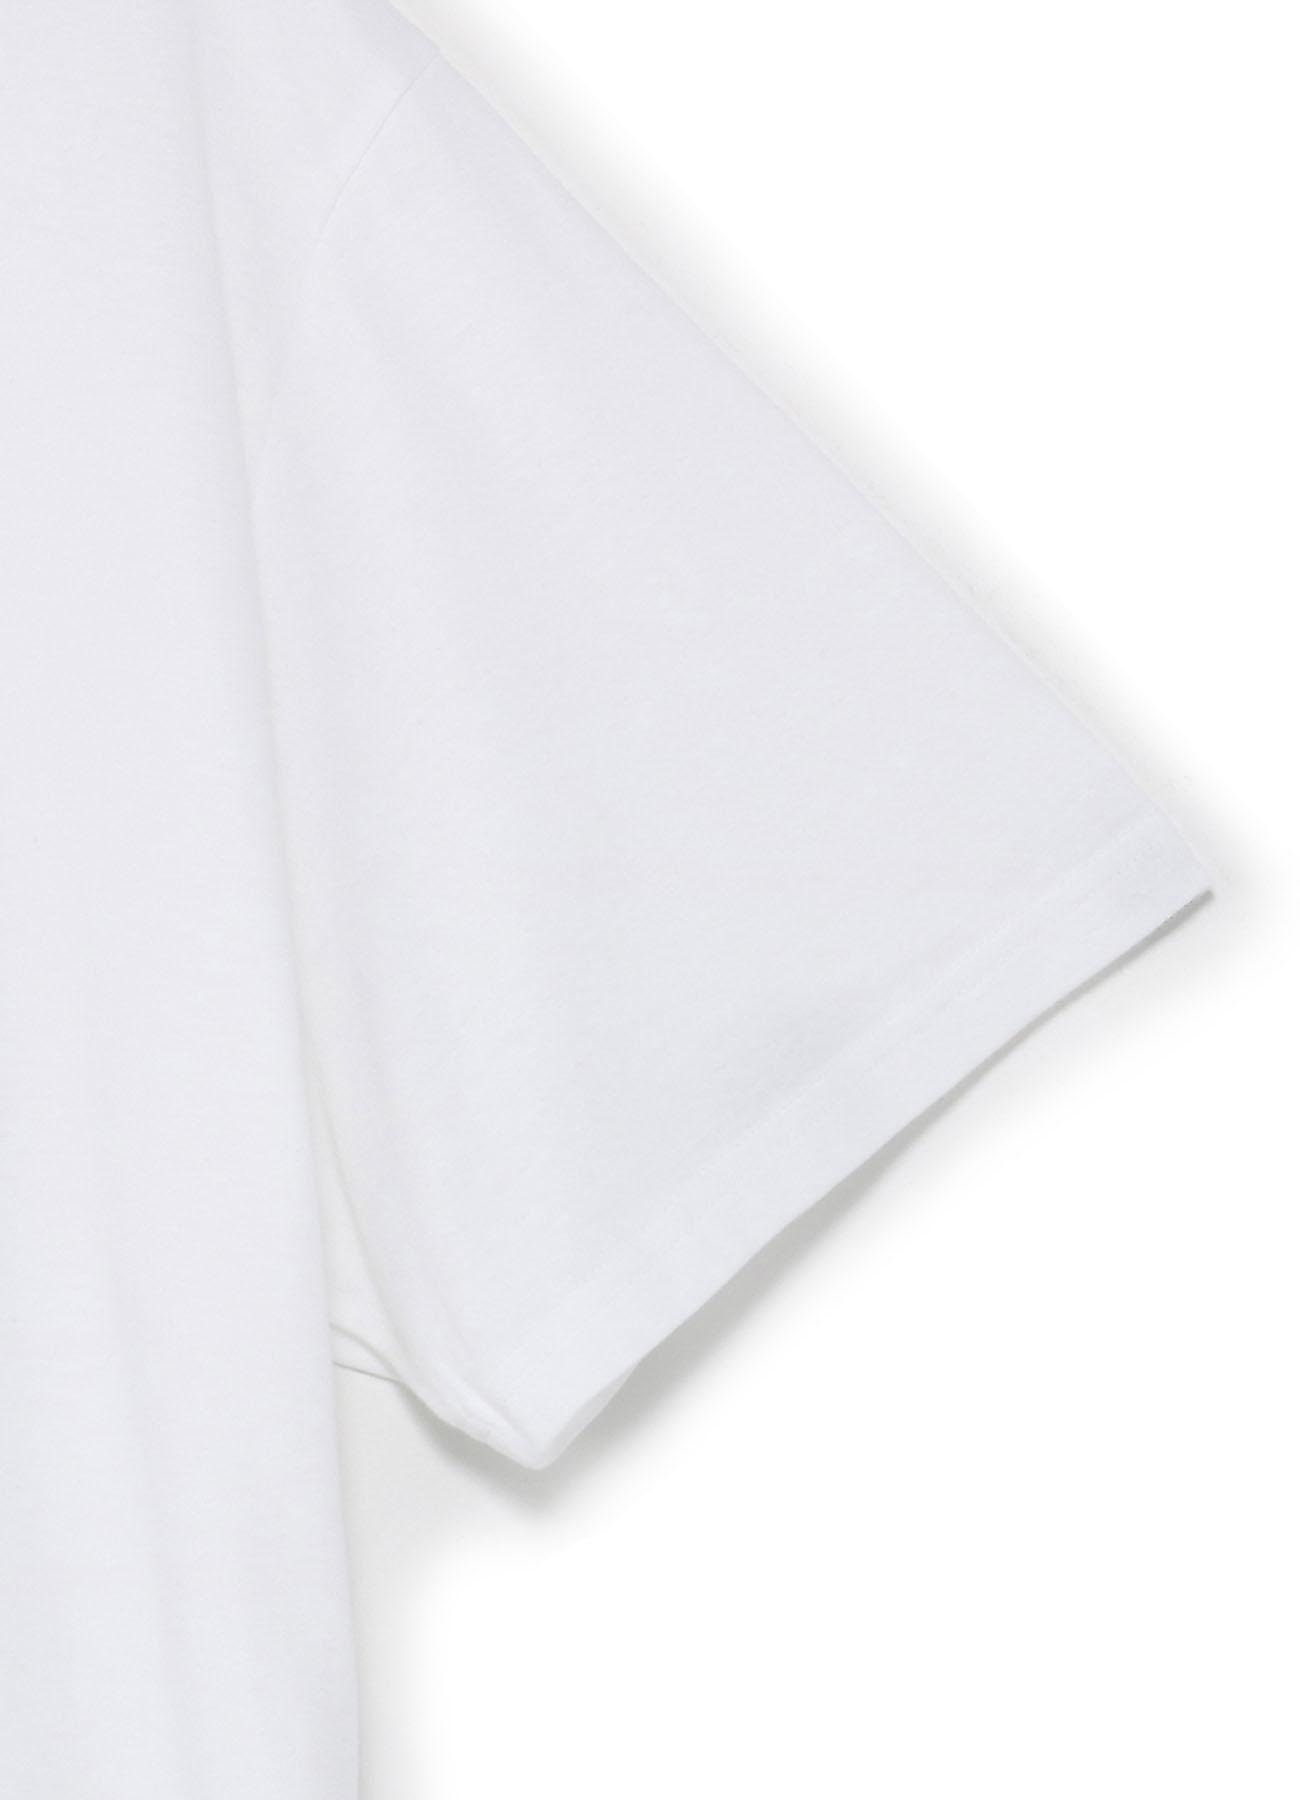 【Ground Y×Mai Fukagawa Collection】30/-Combed Cotton Jersey Cut Sew [夢の中]